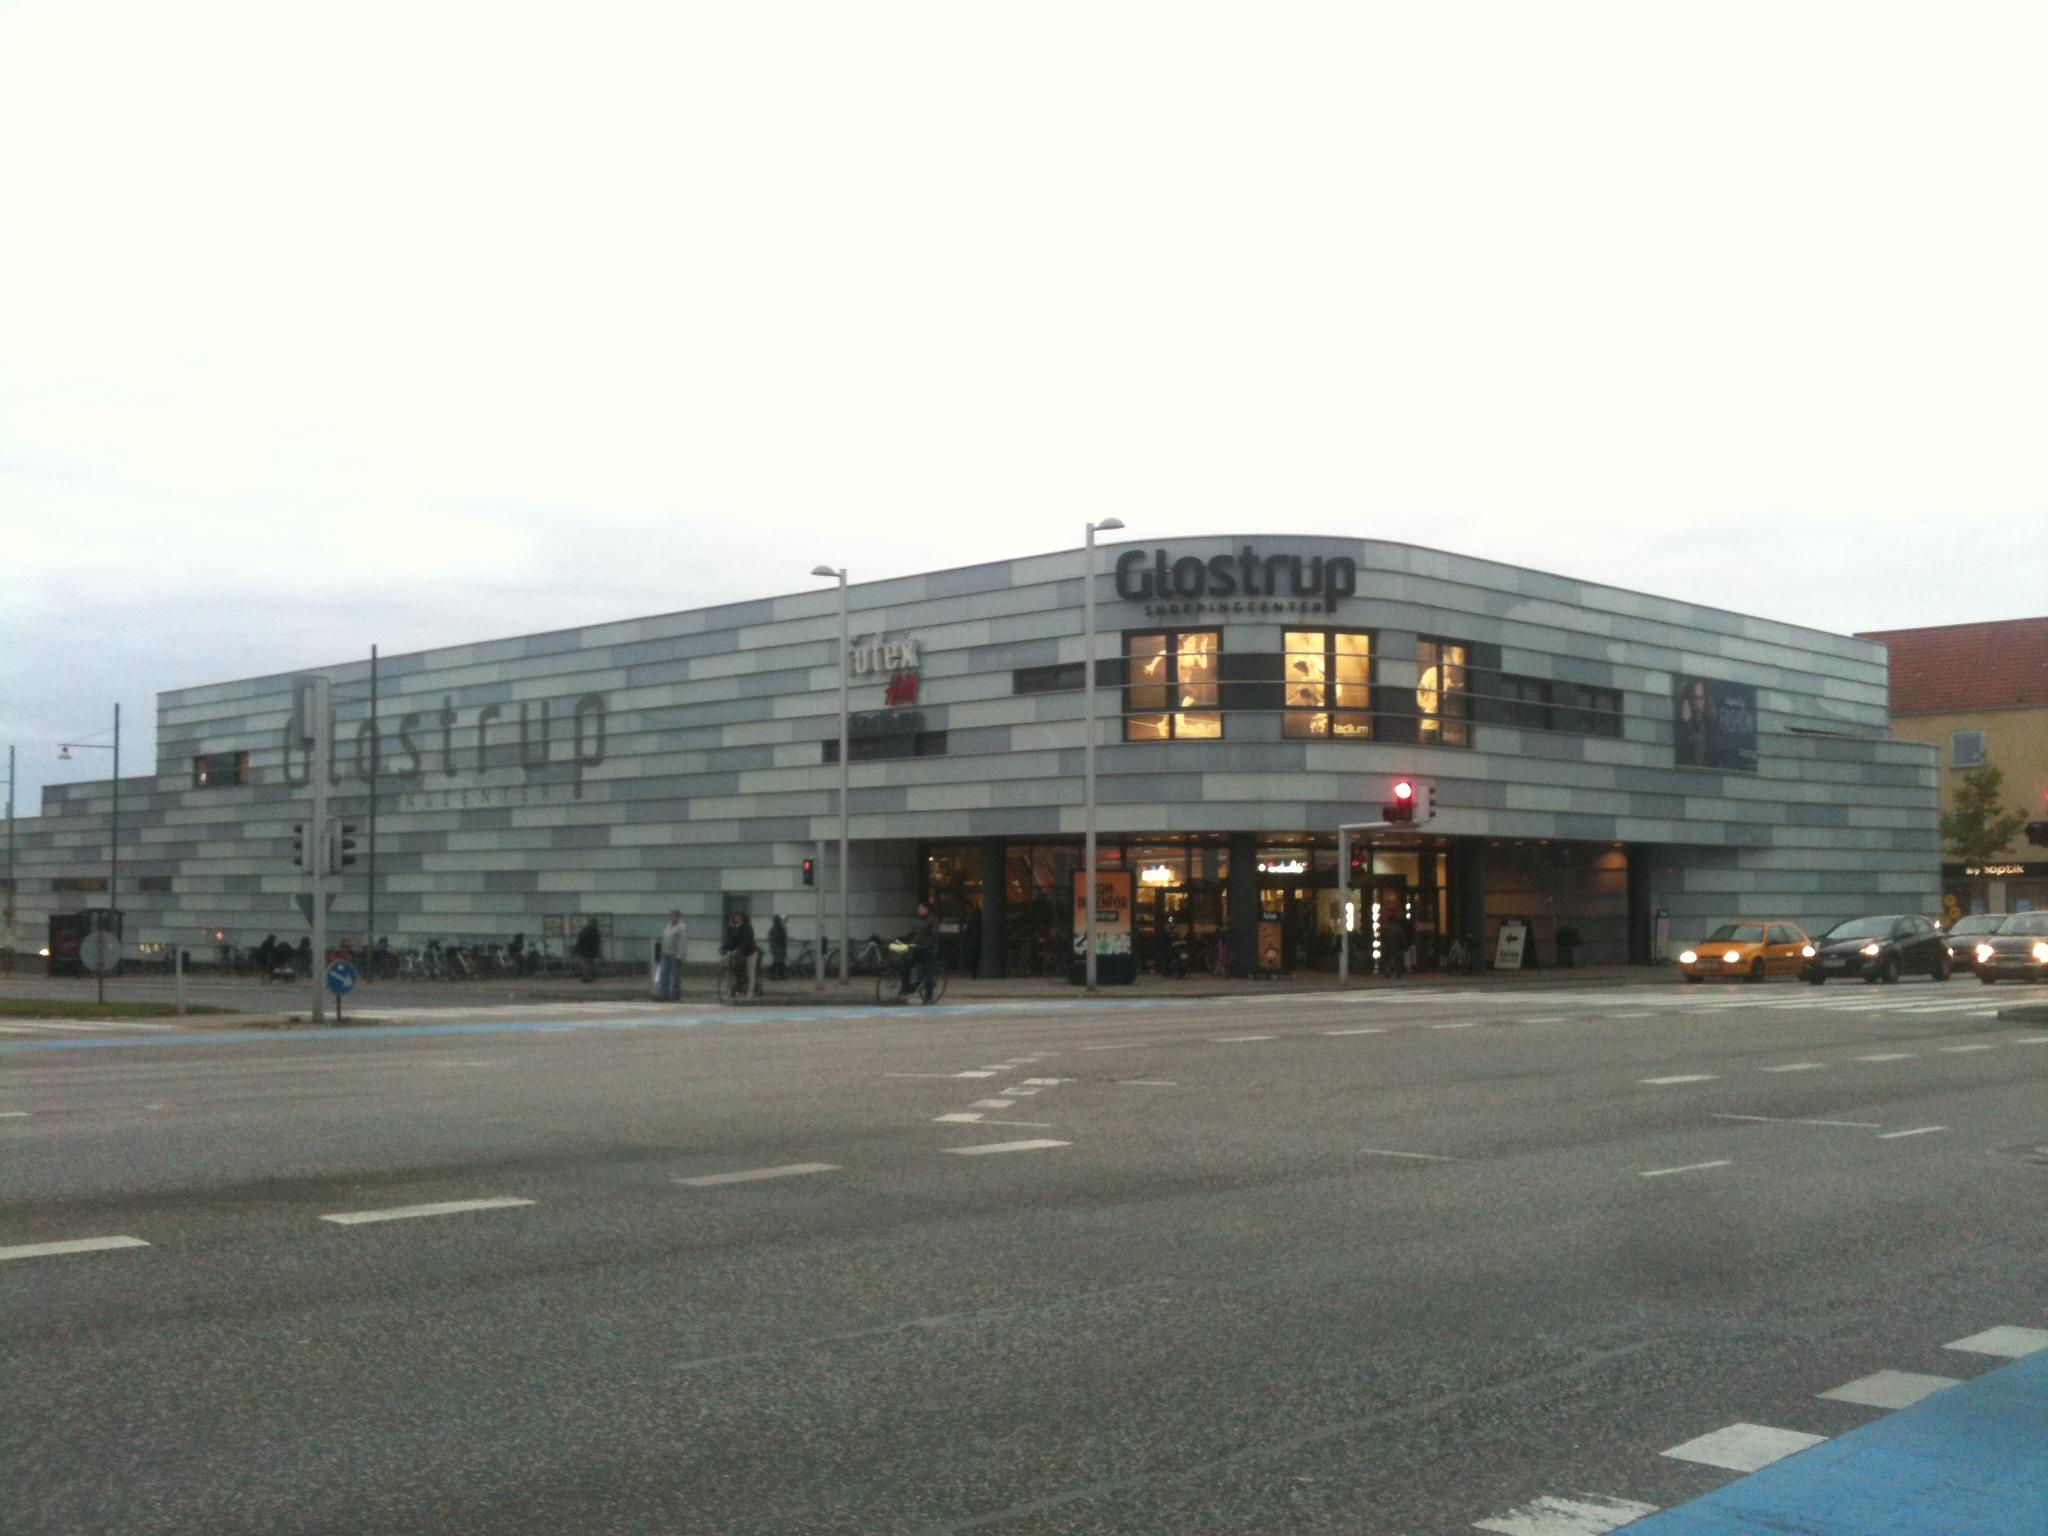 glostrup shopping center